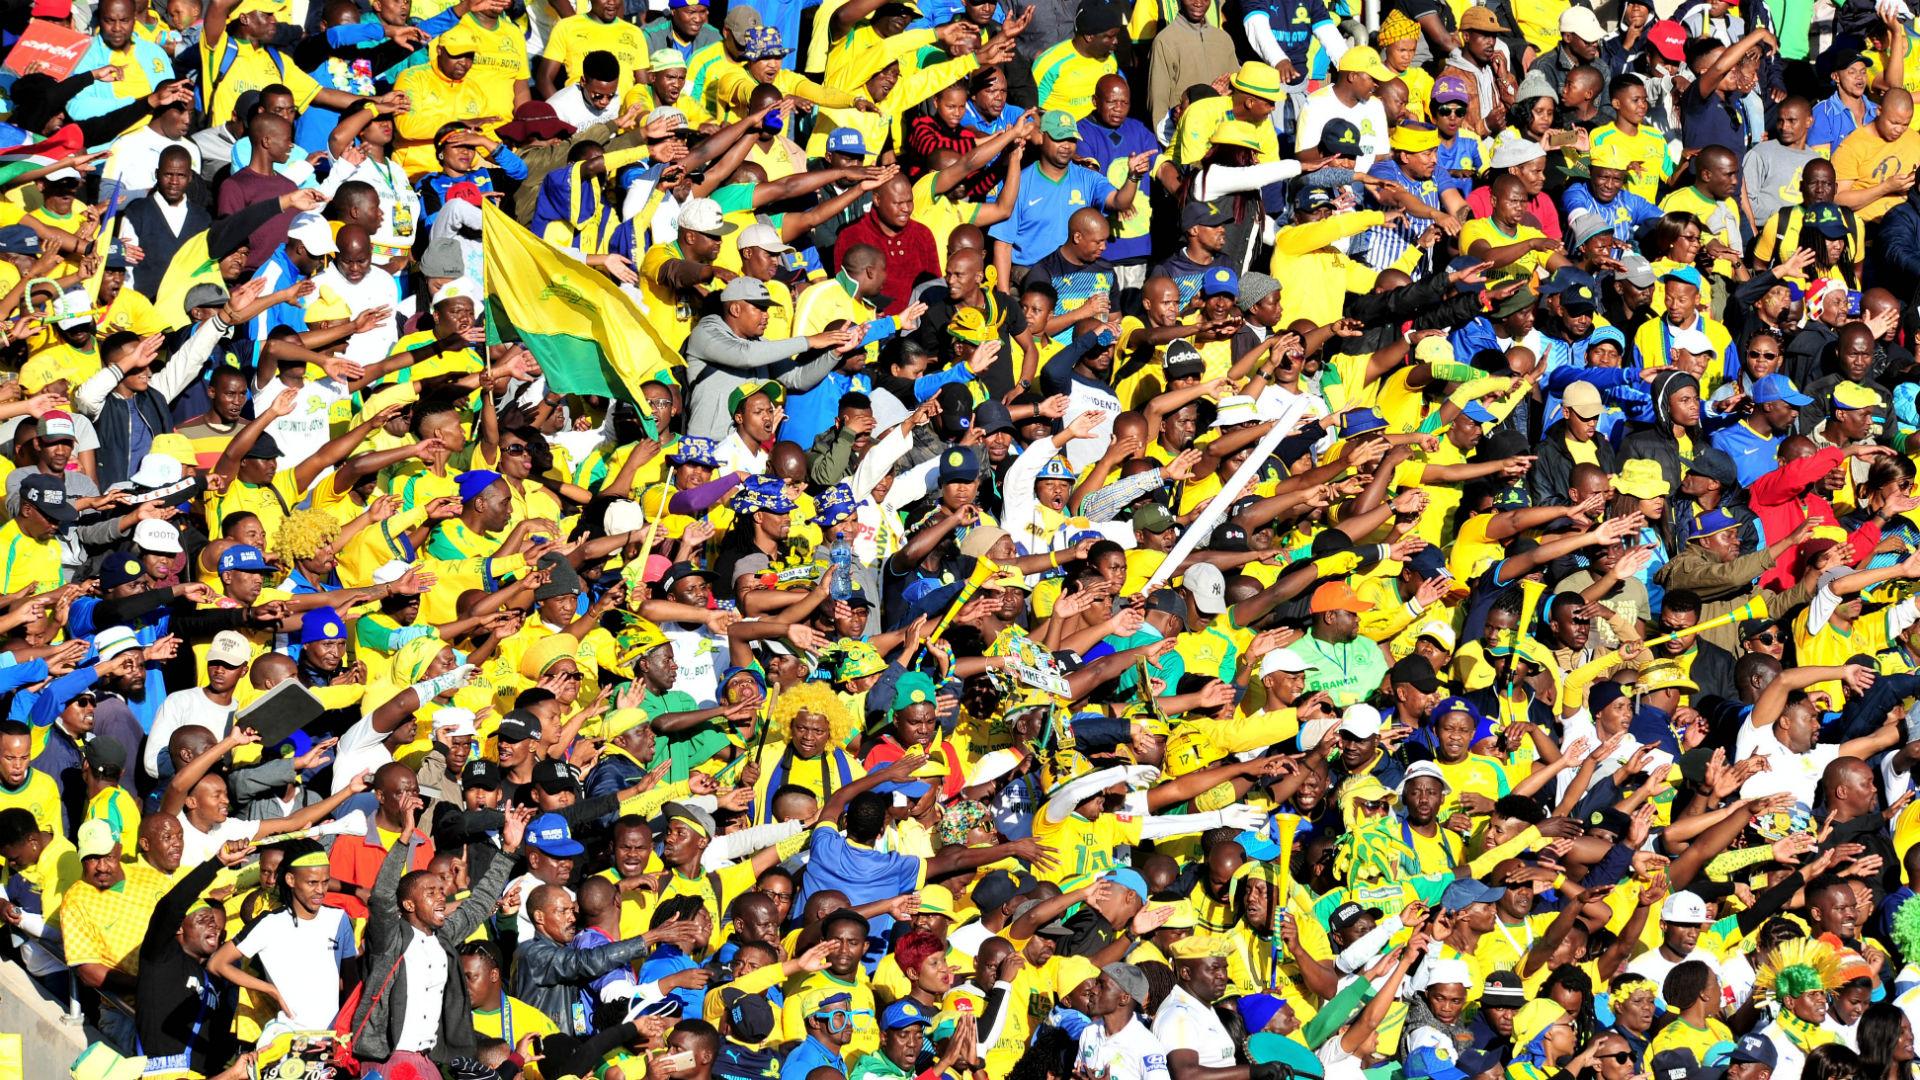 Fan View: 'Mamelodi Sundowns to win Club World Cup via backdoor'